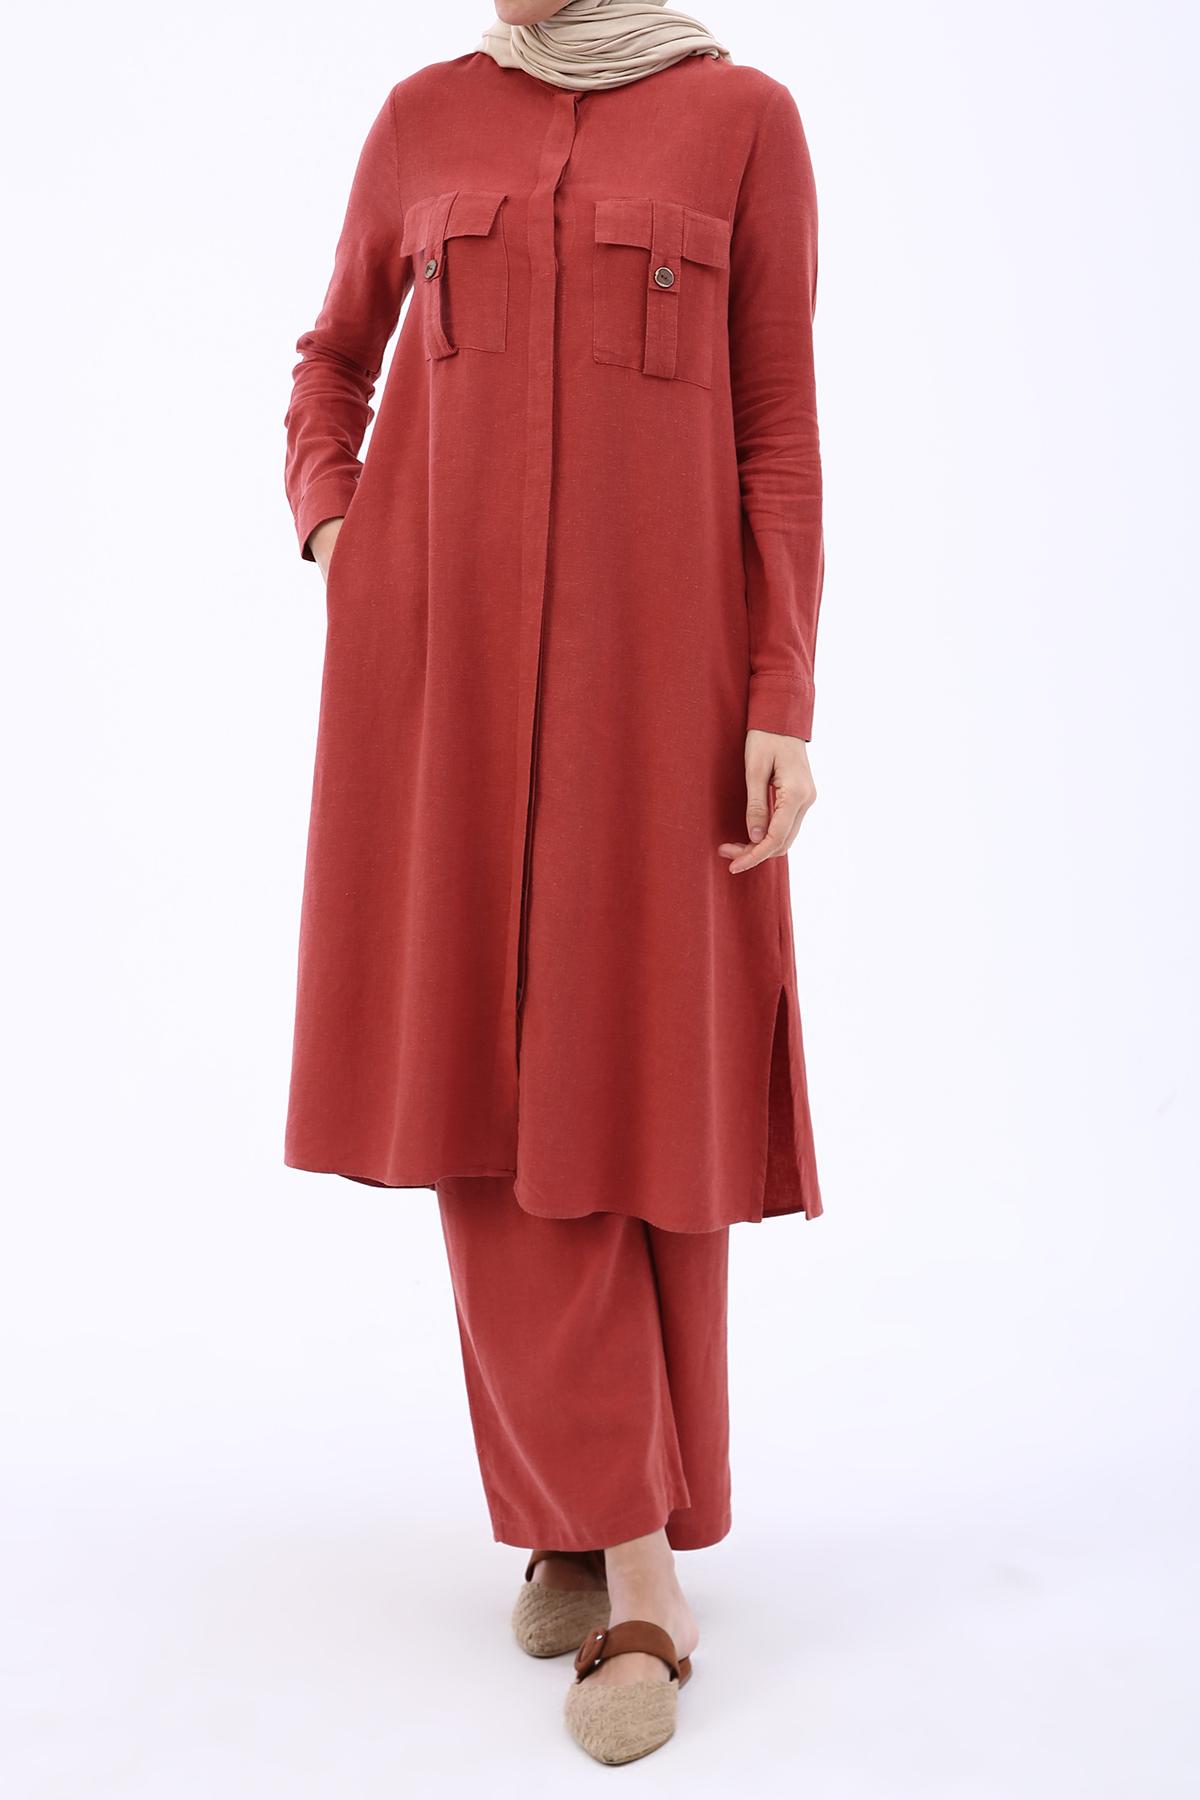 Flap Pocket Long Linen Shirt and Comfy Pants Outfit Set